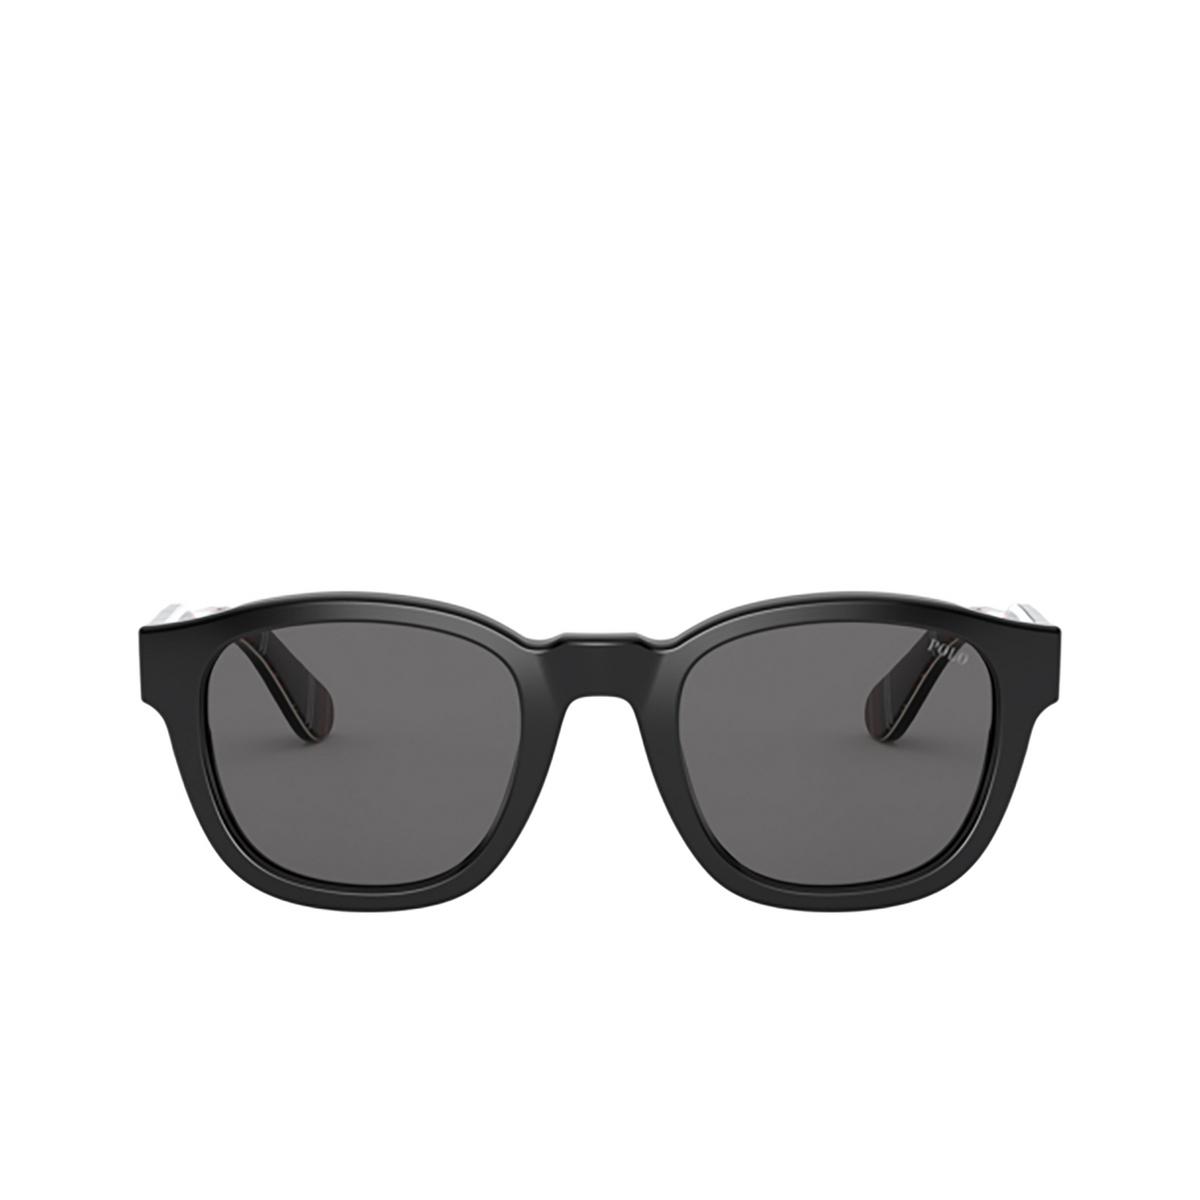 Polo Ralph Lauren® Square Sunglasses: PH4159 color Shiny Black 500187.